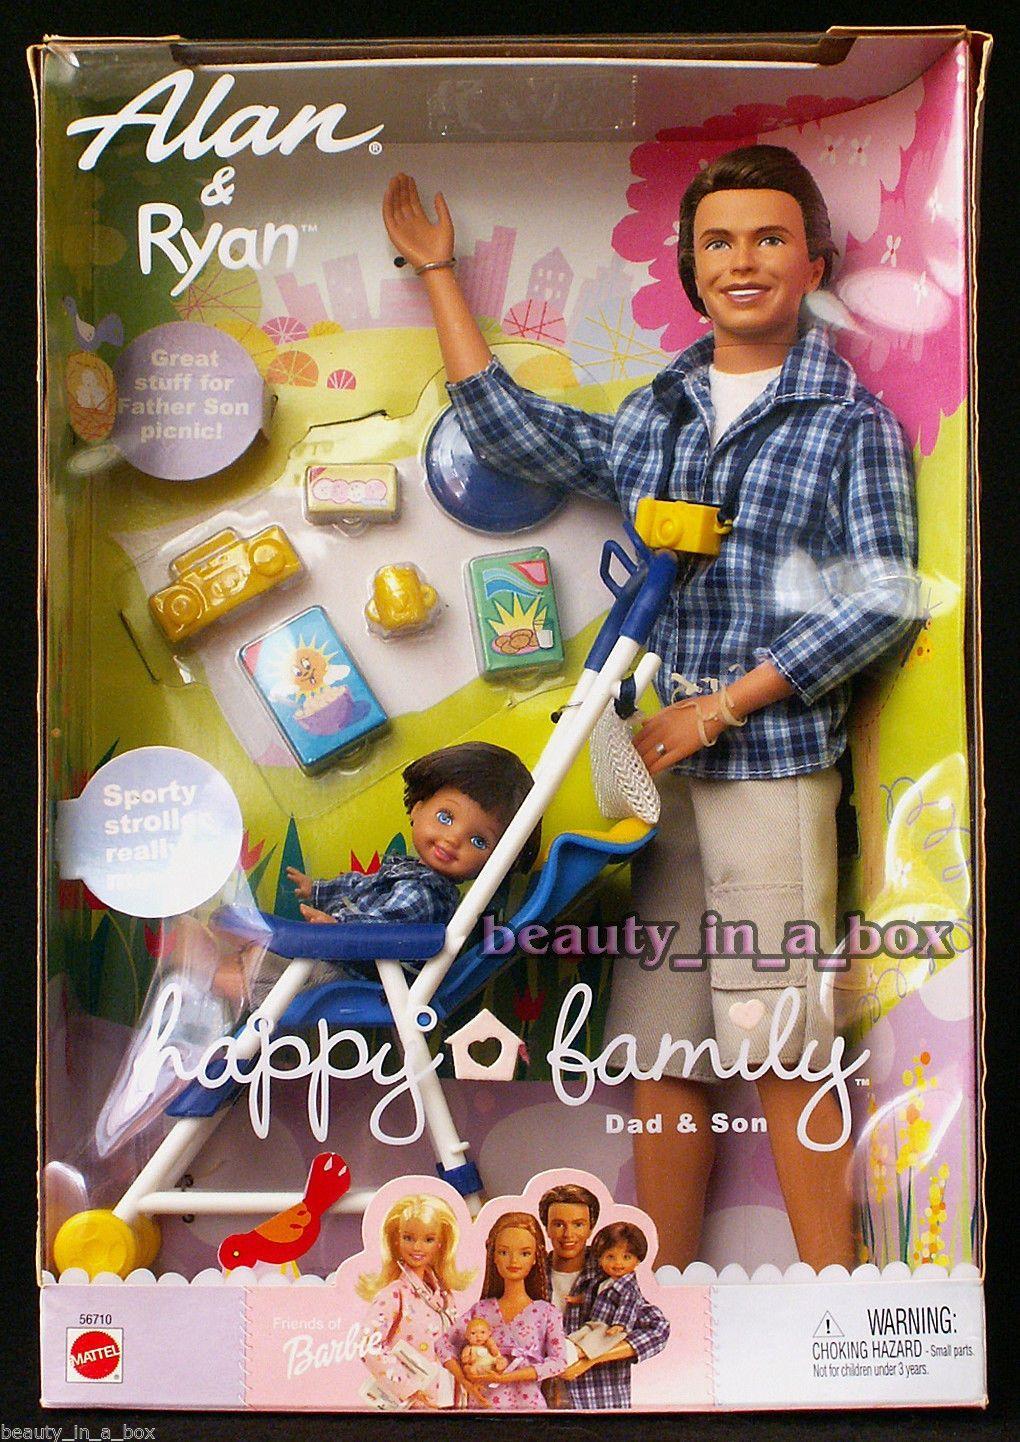 Happy Family Alan® Doll and Ryan® Doll Barbie happy